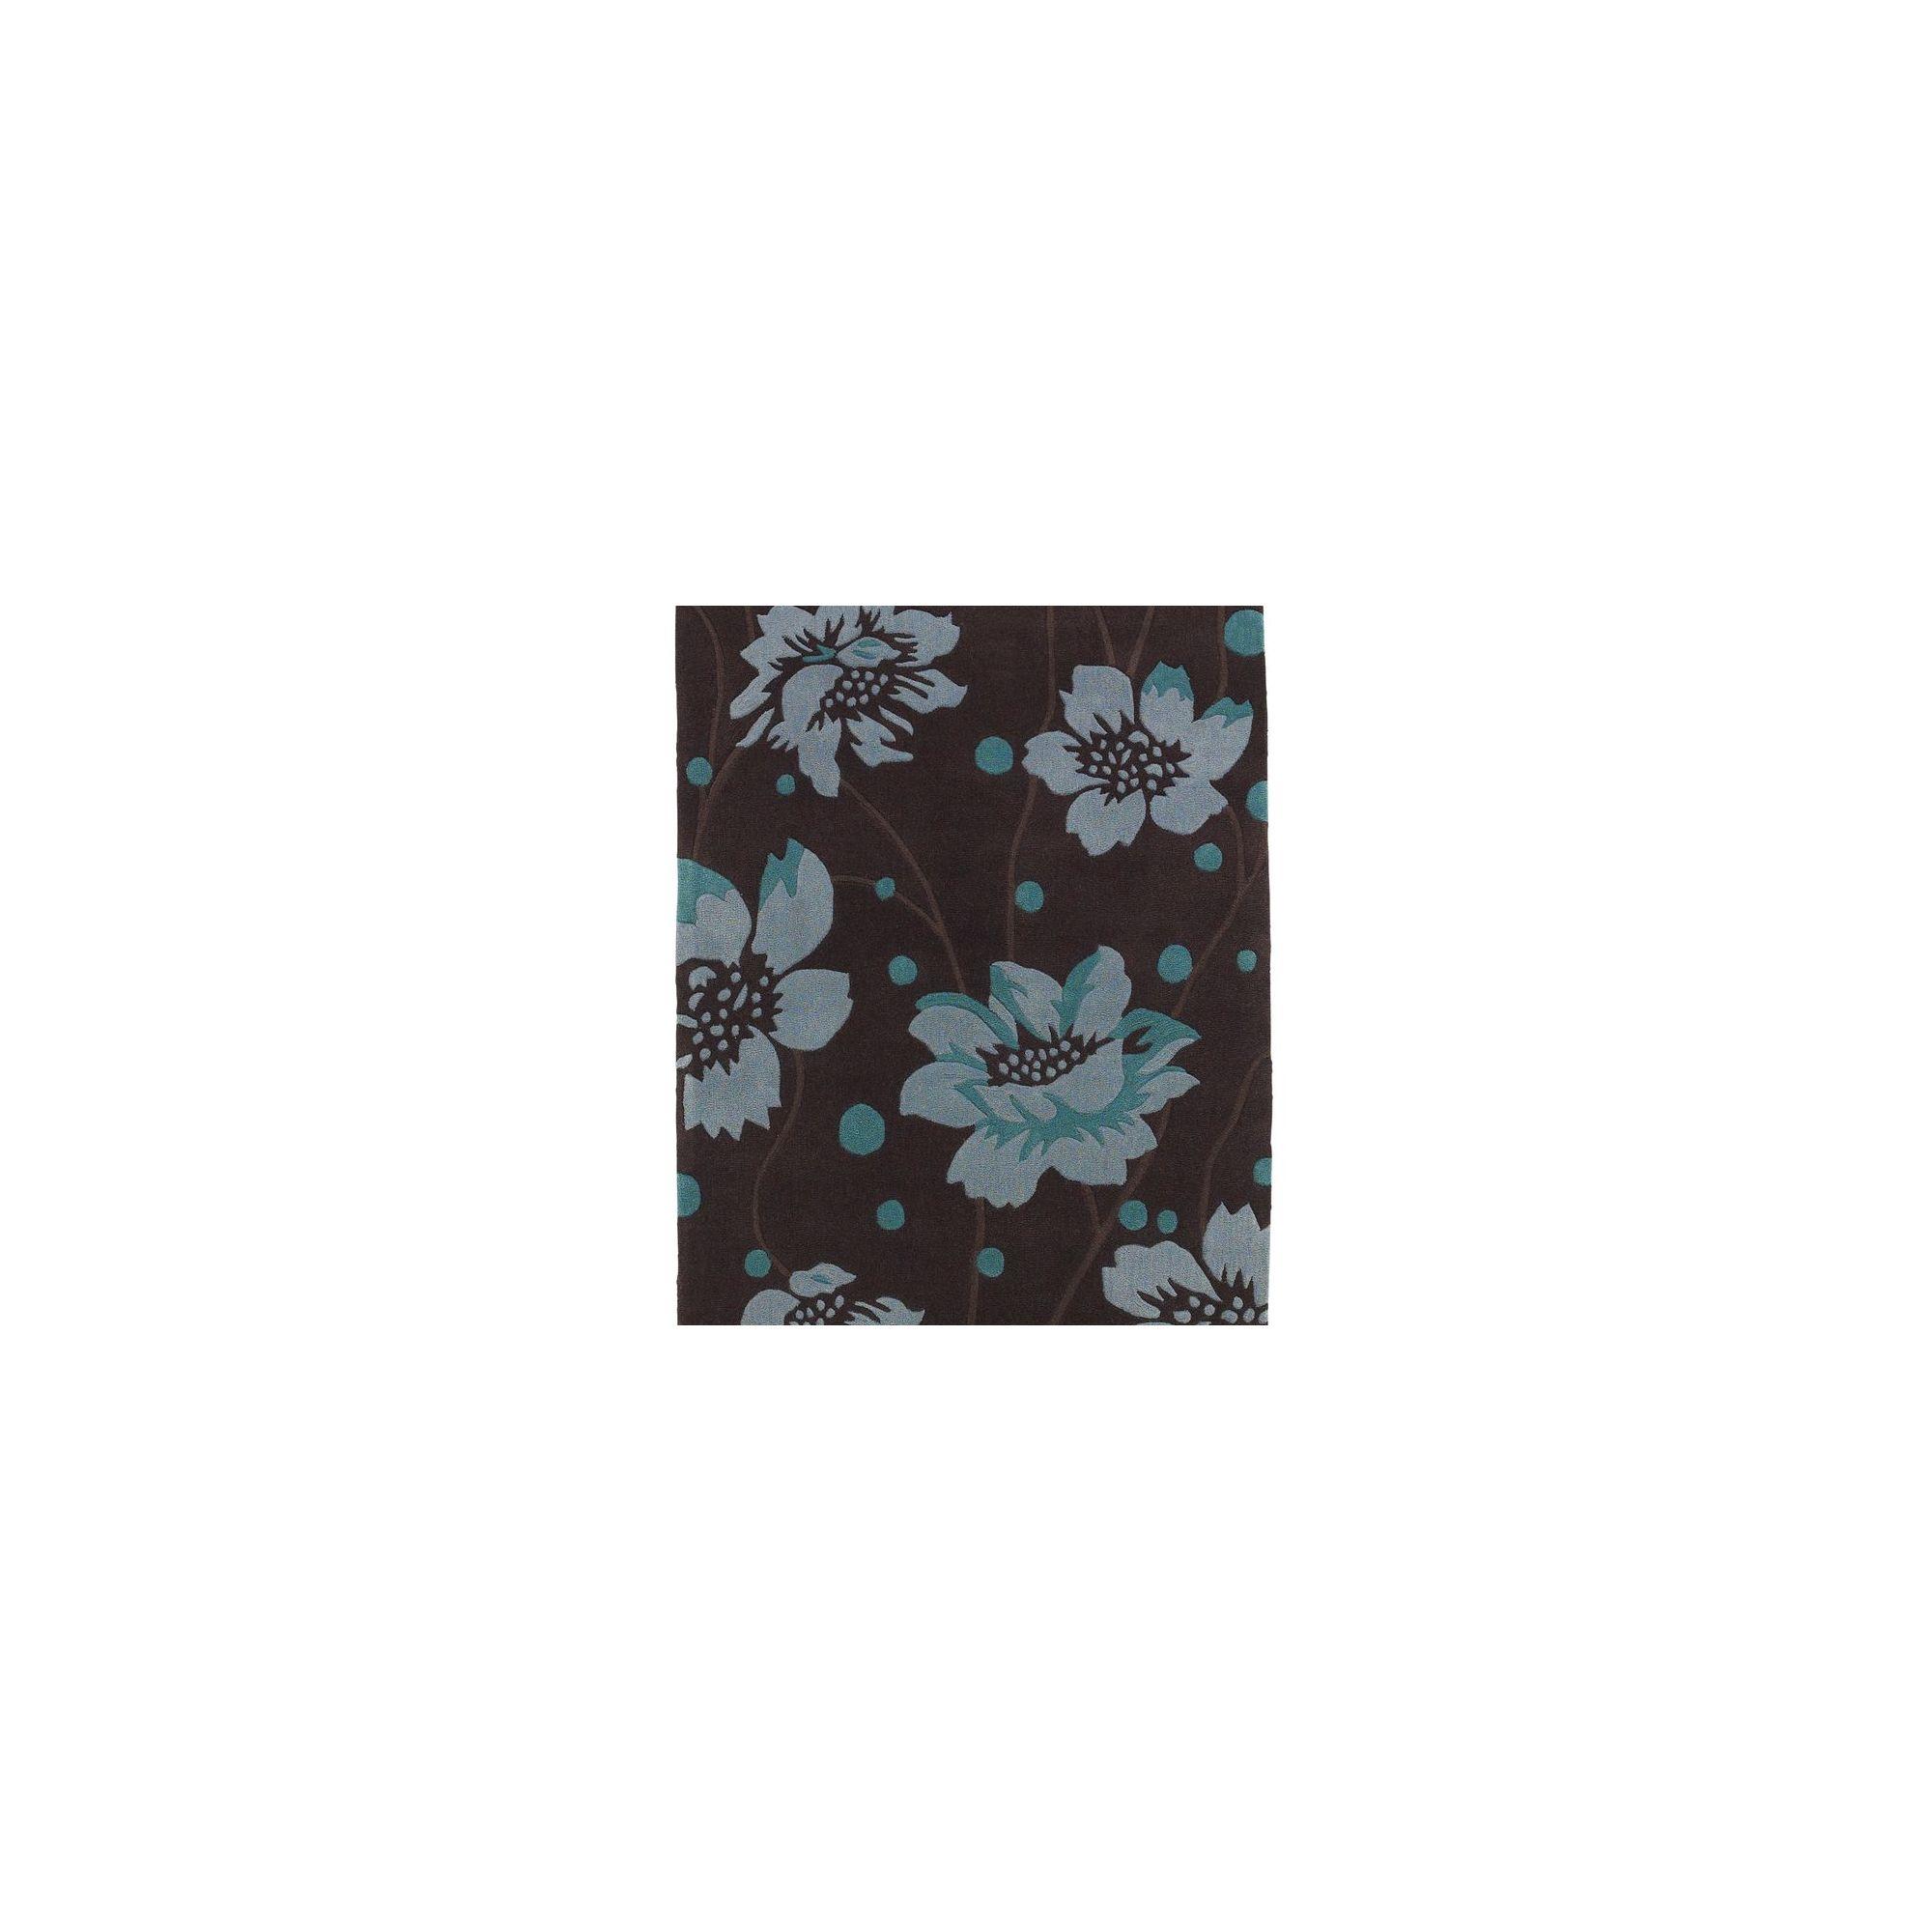 Oriental Carpets & Rugs Hong Kong Brown/Blue Tufted Rug - 150cm L x 90cm W